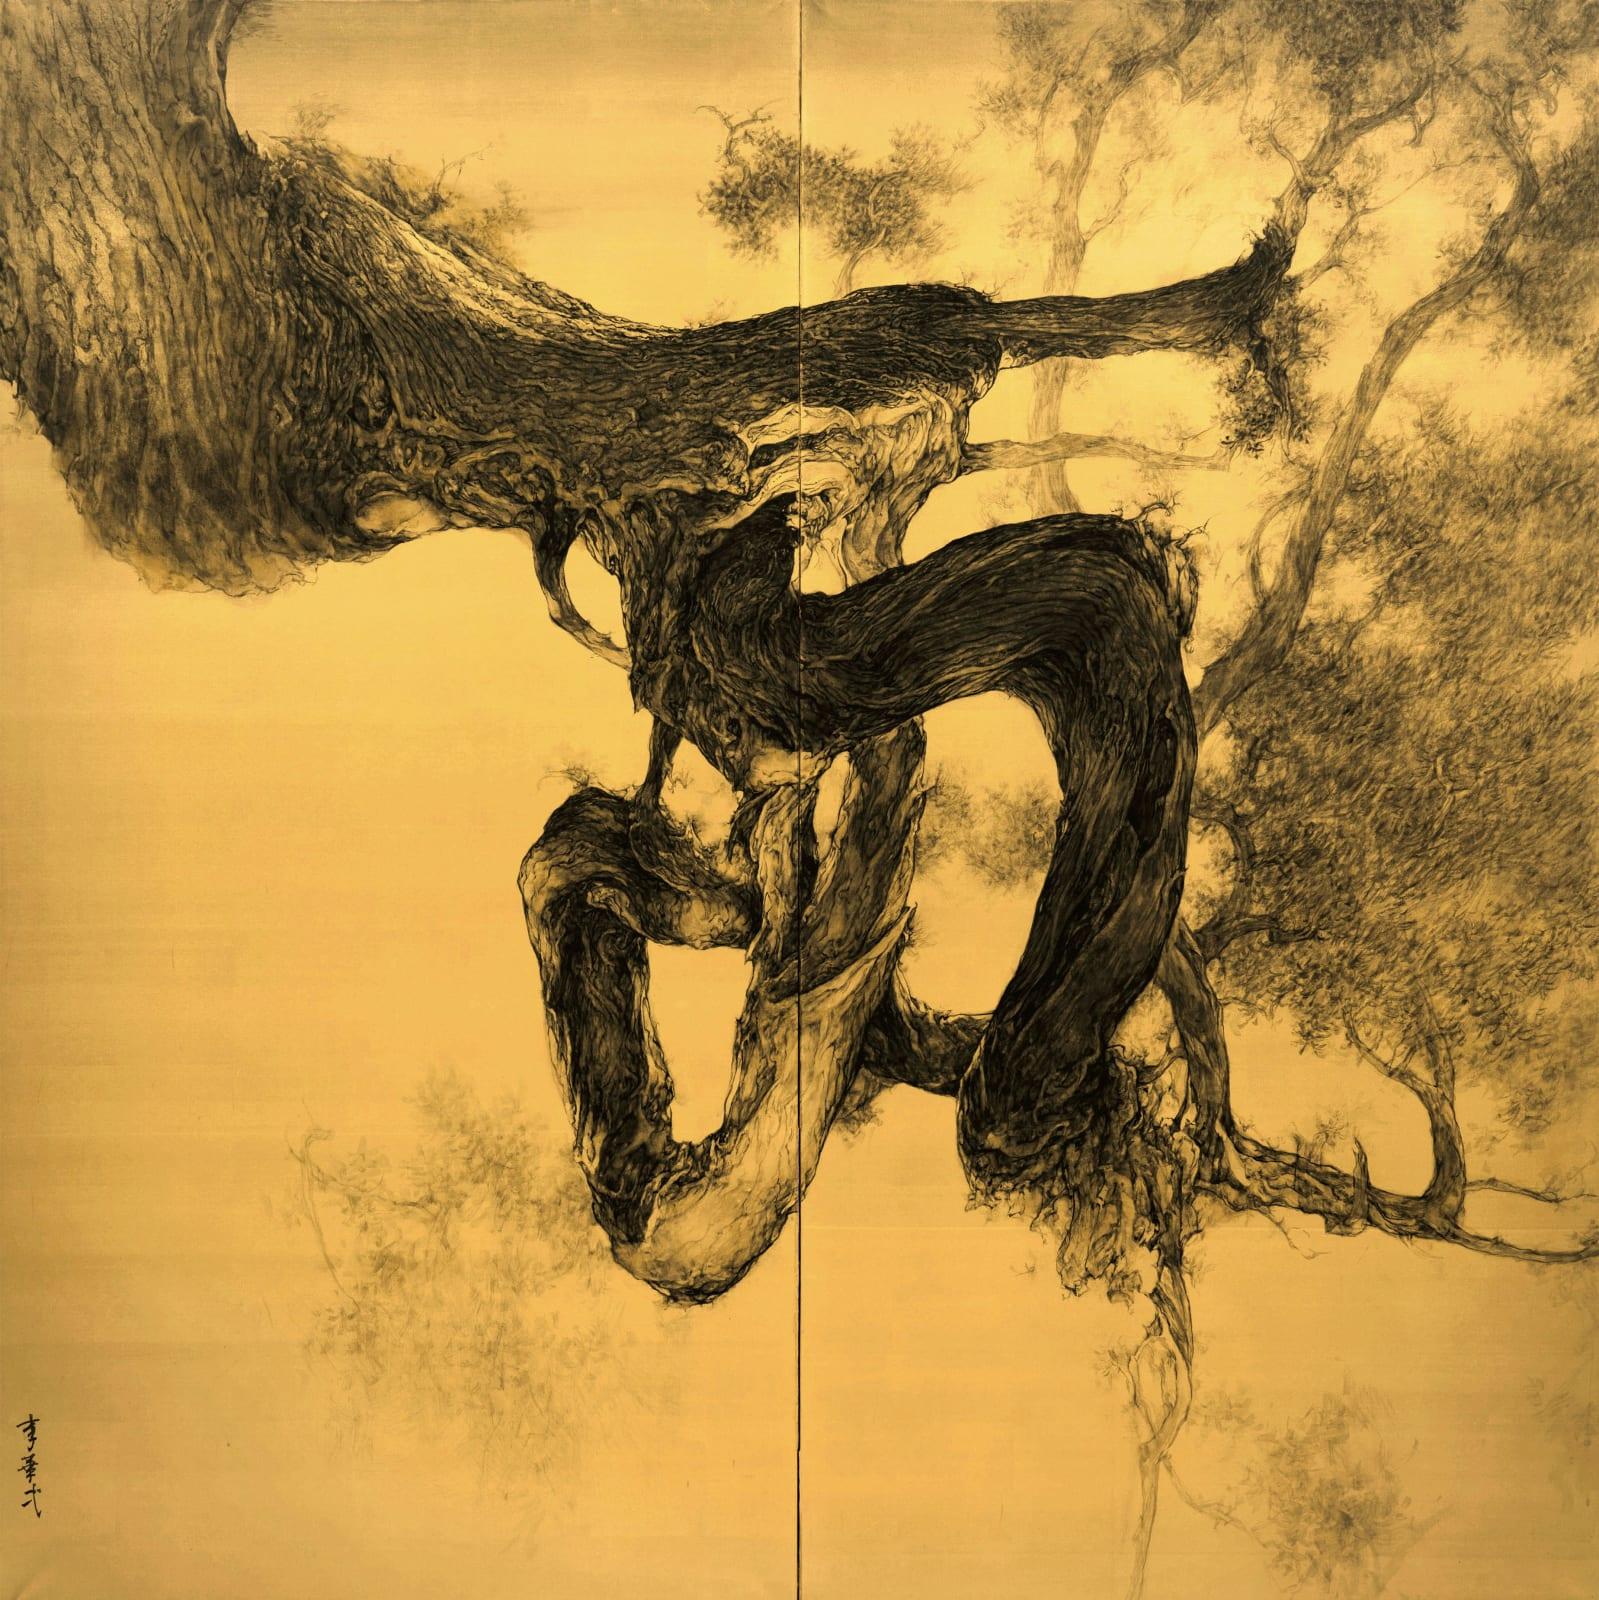 Li Huayi 李華弌, A View of Eternity 《一目無盡》, 2017